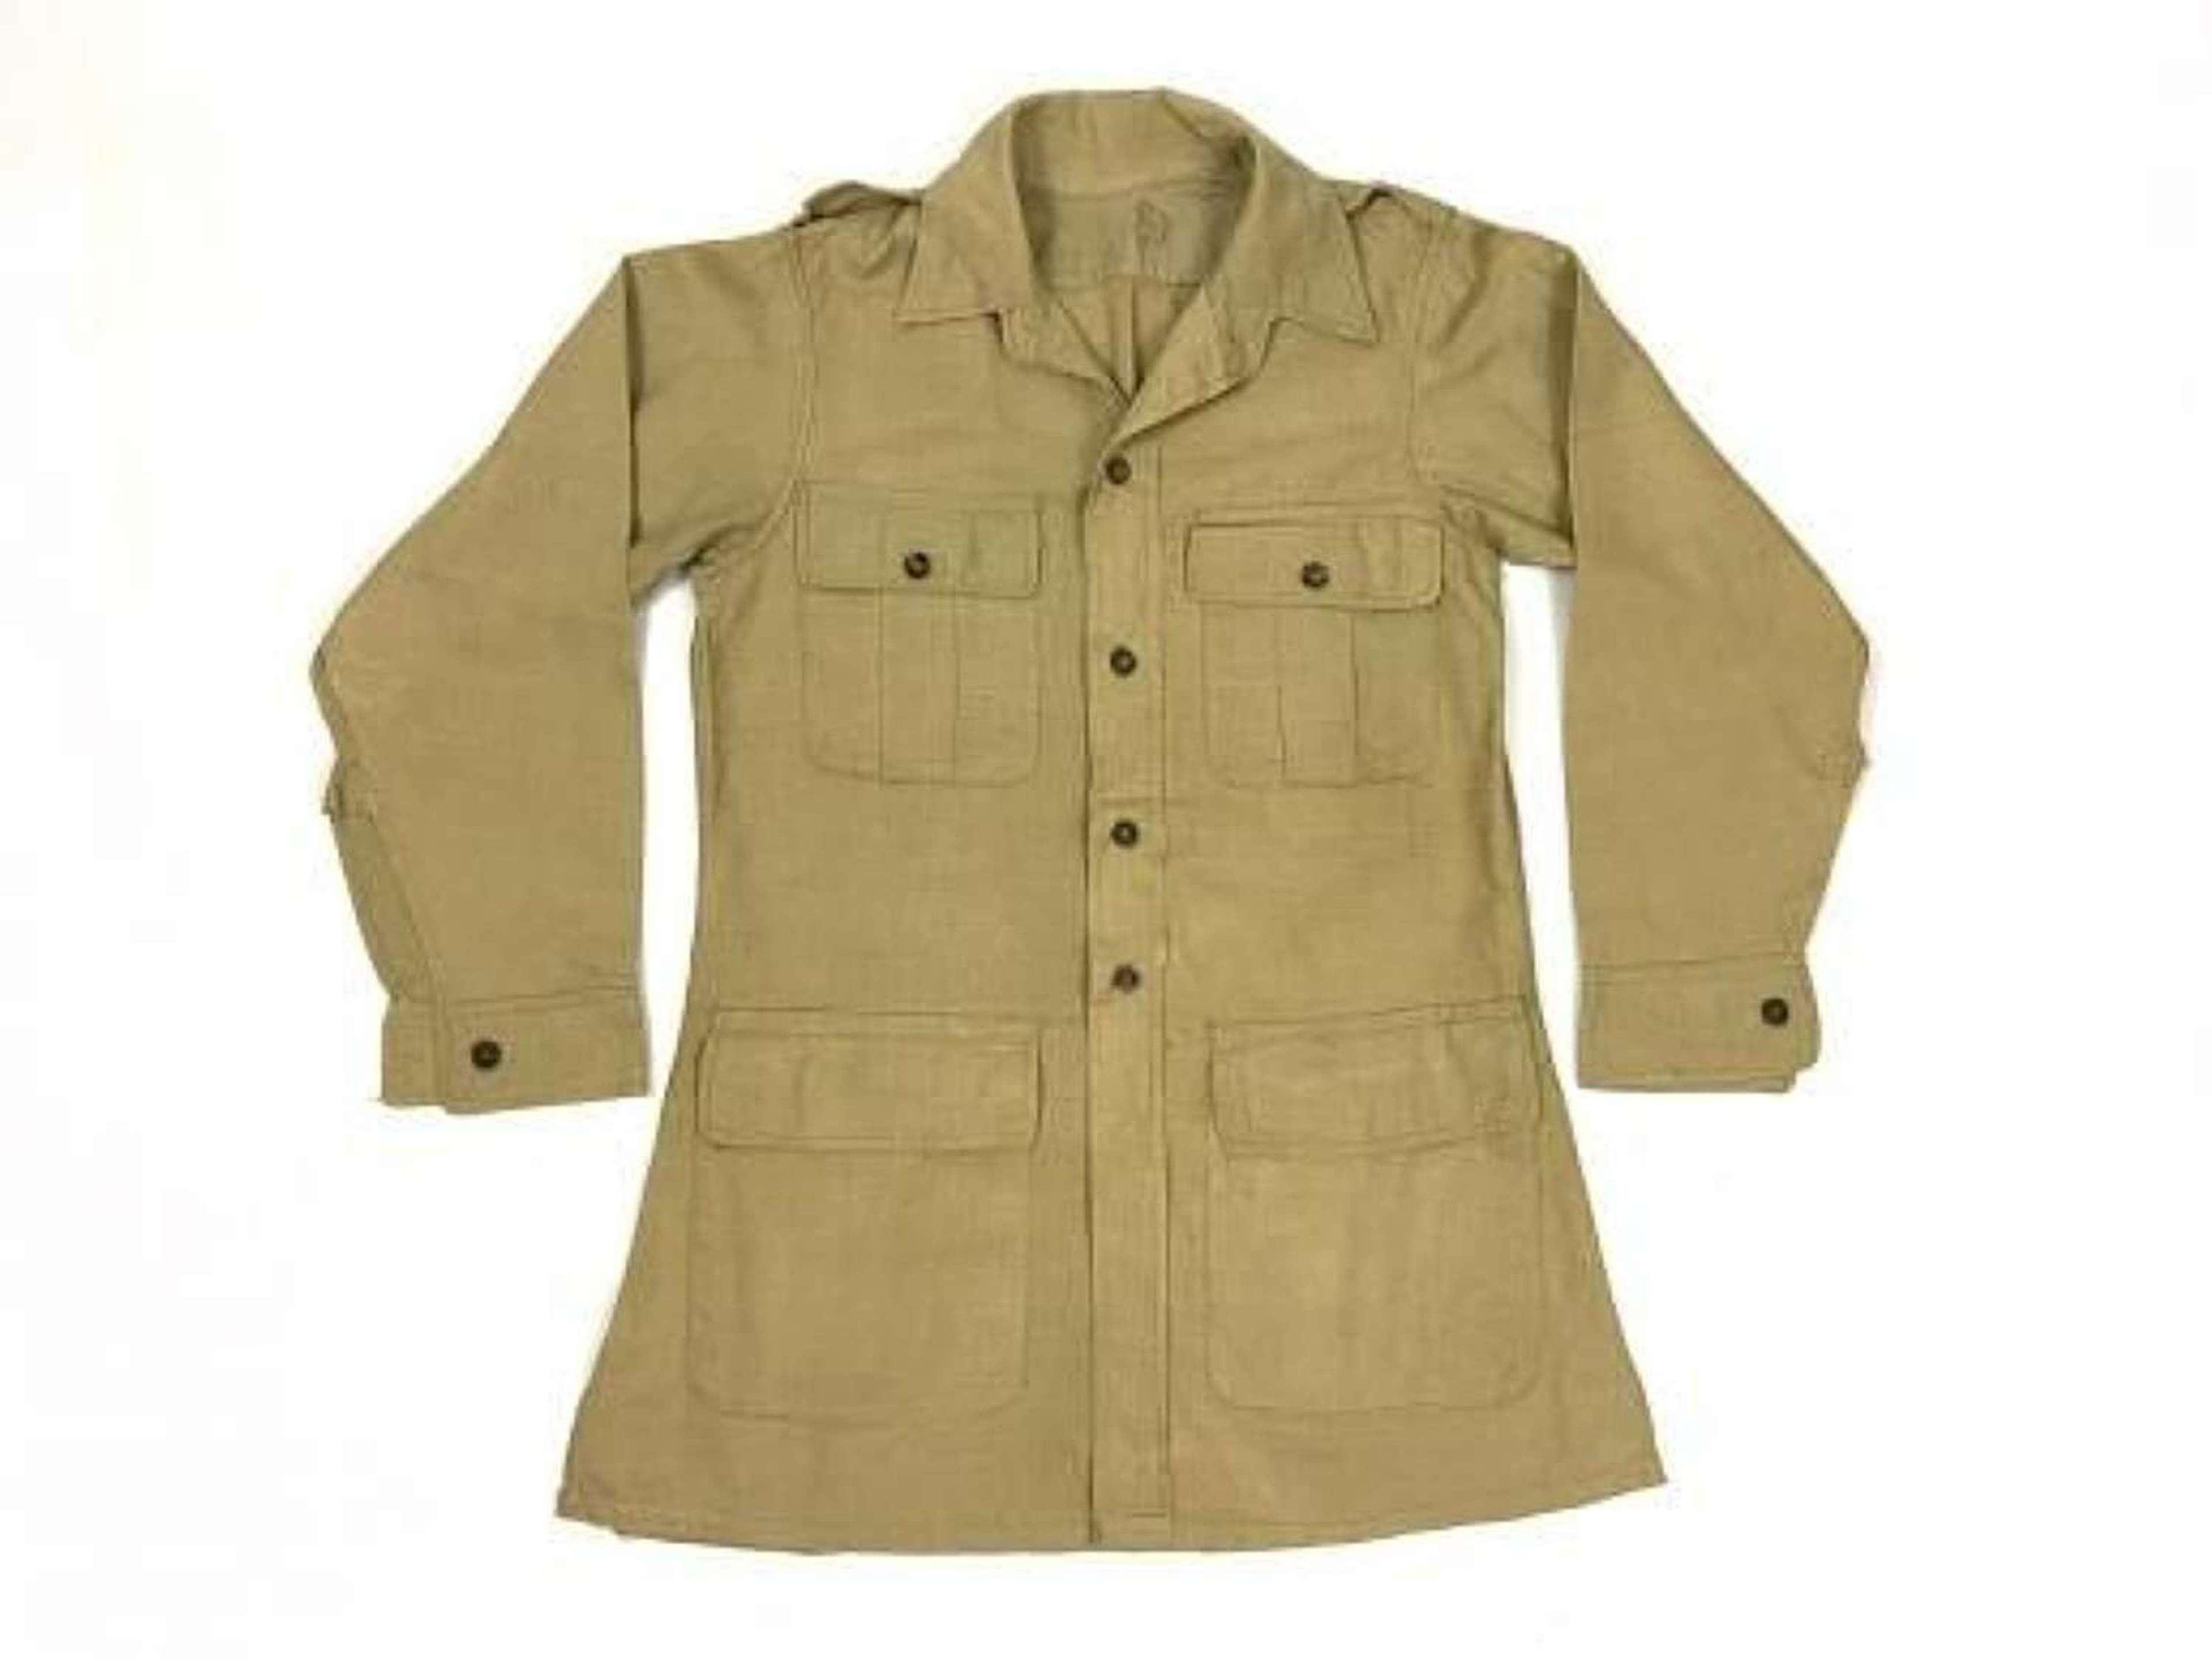 Original 1943 Dated British Army Aertex Bush jacket